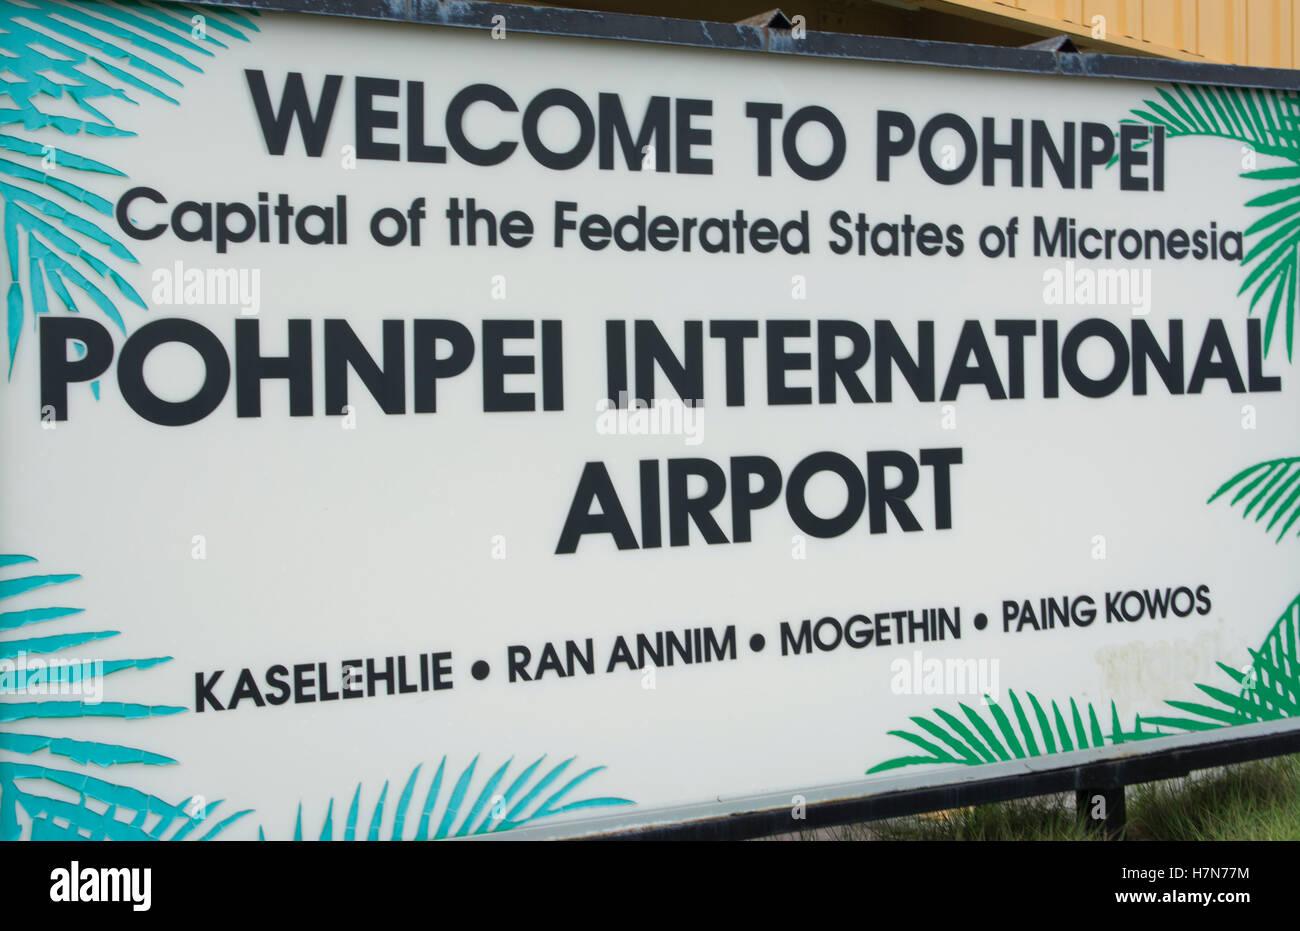 Pohnpei Mikronesien Flughafen Zeichen begrüßen Ankunft Stockbild